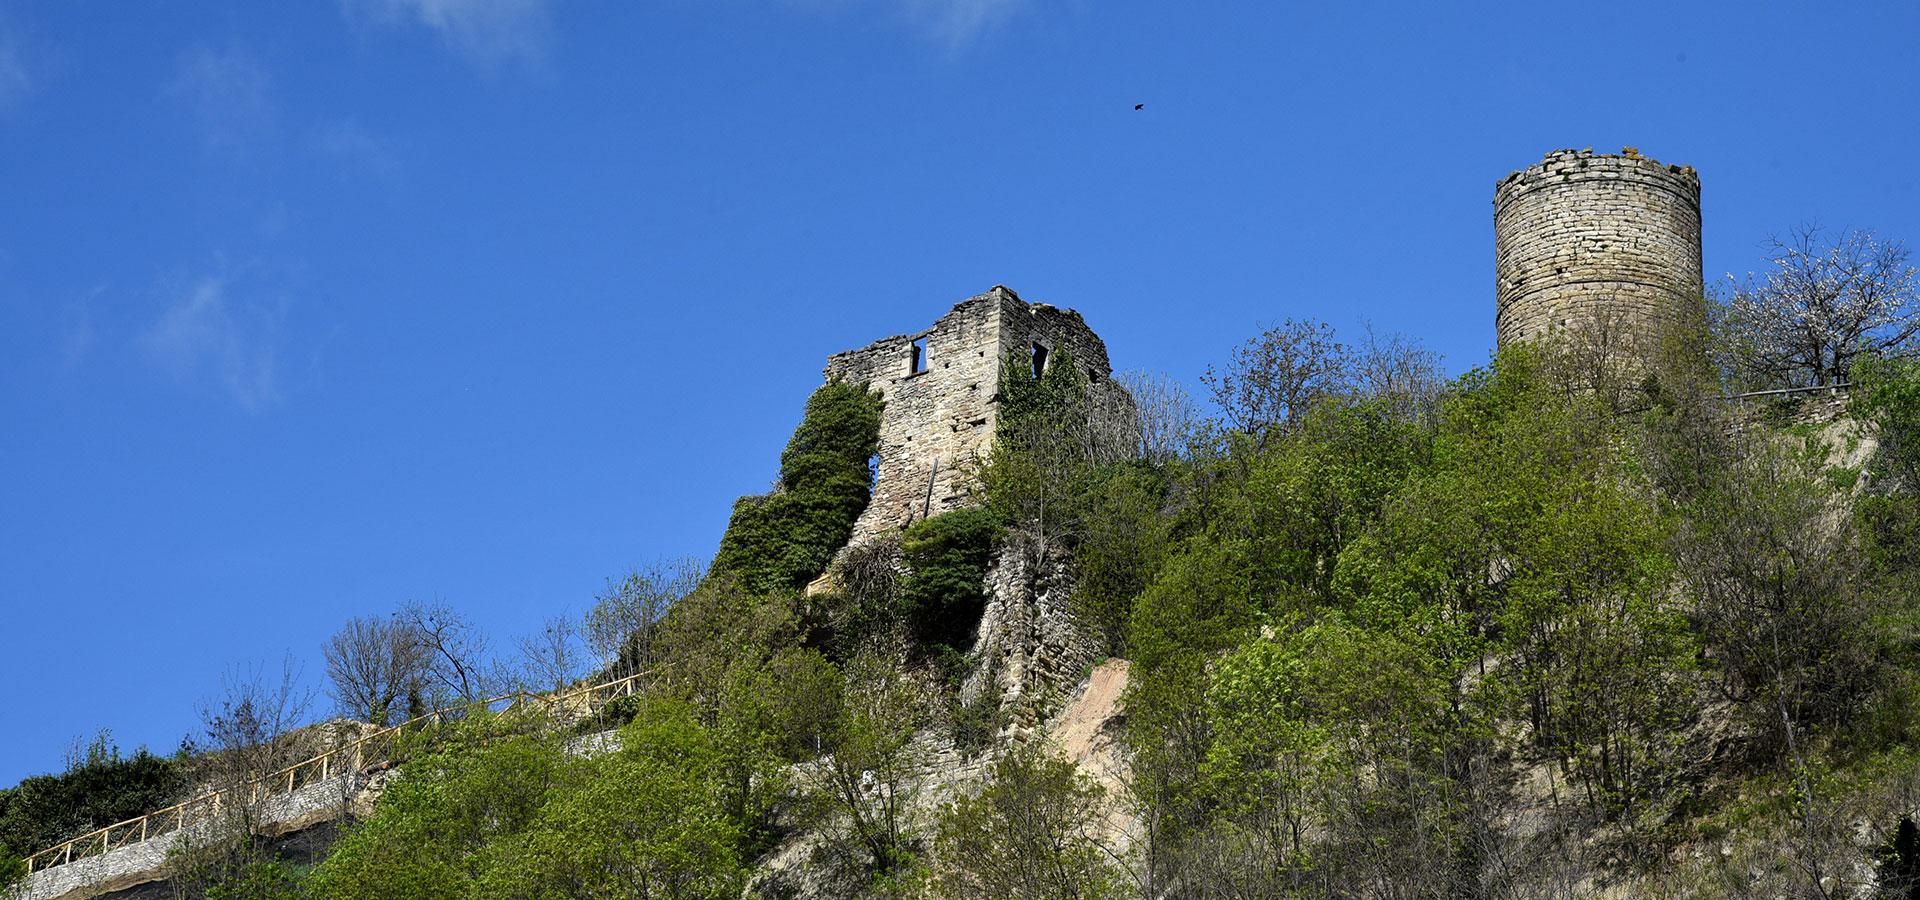 Torre-di-cortemilia-3